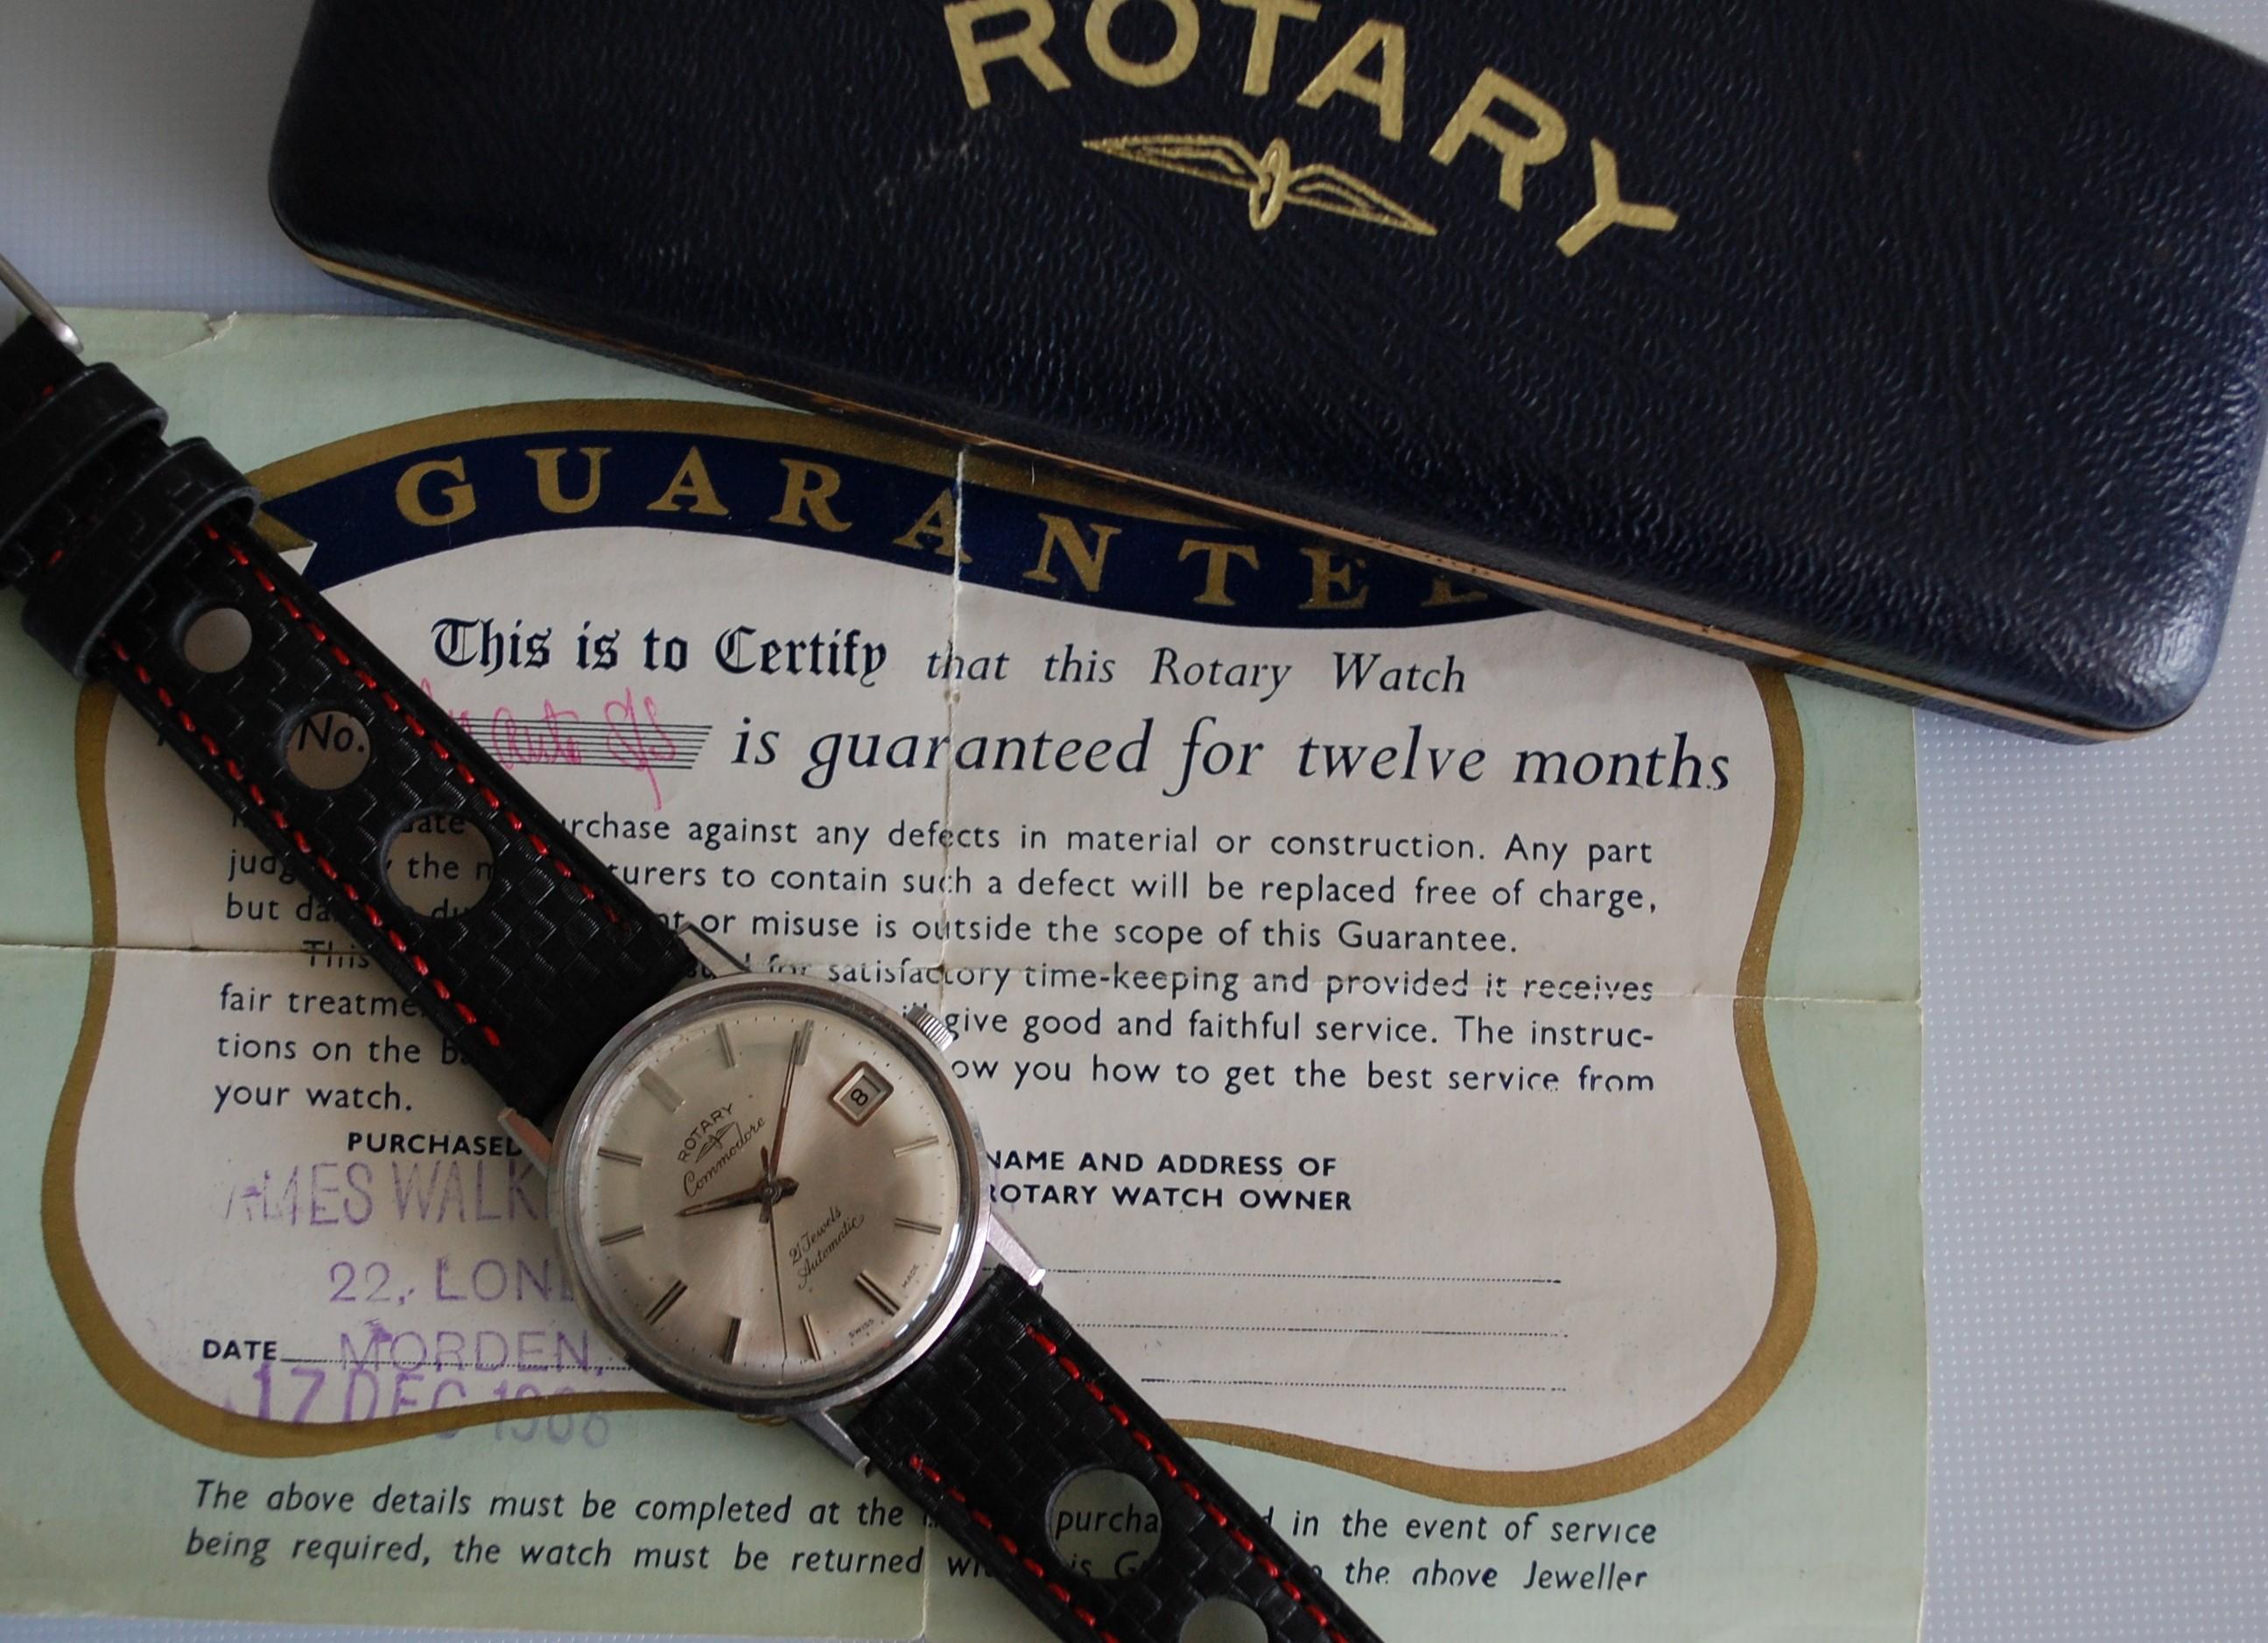 rotary часы фото видео инструкция